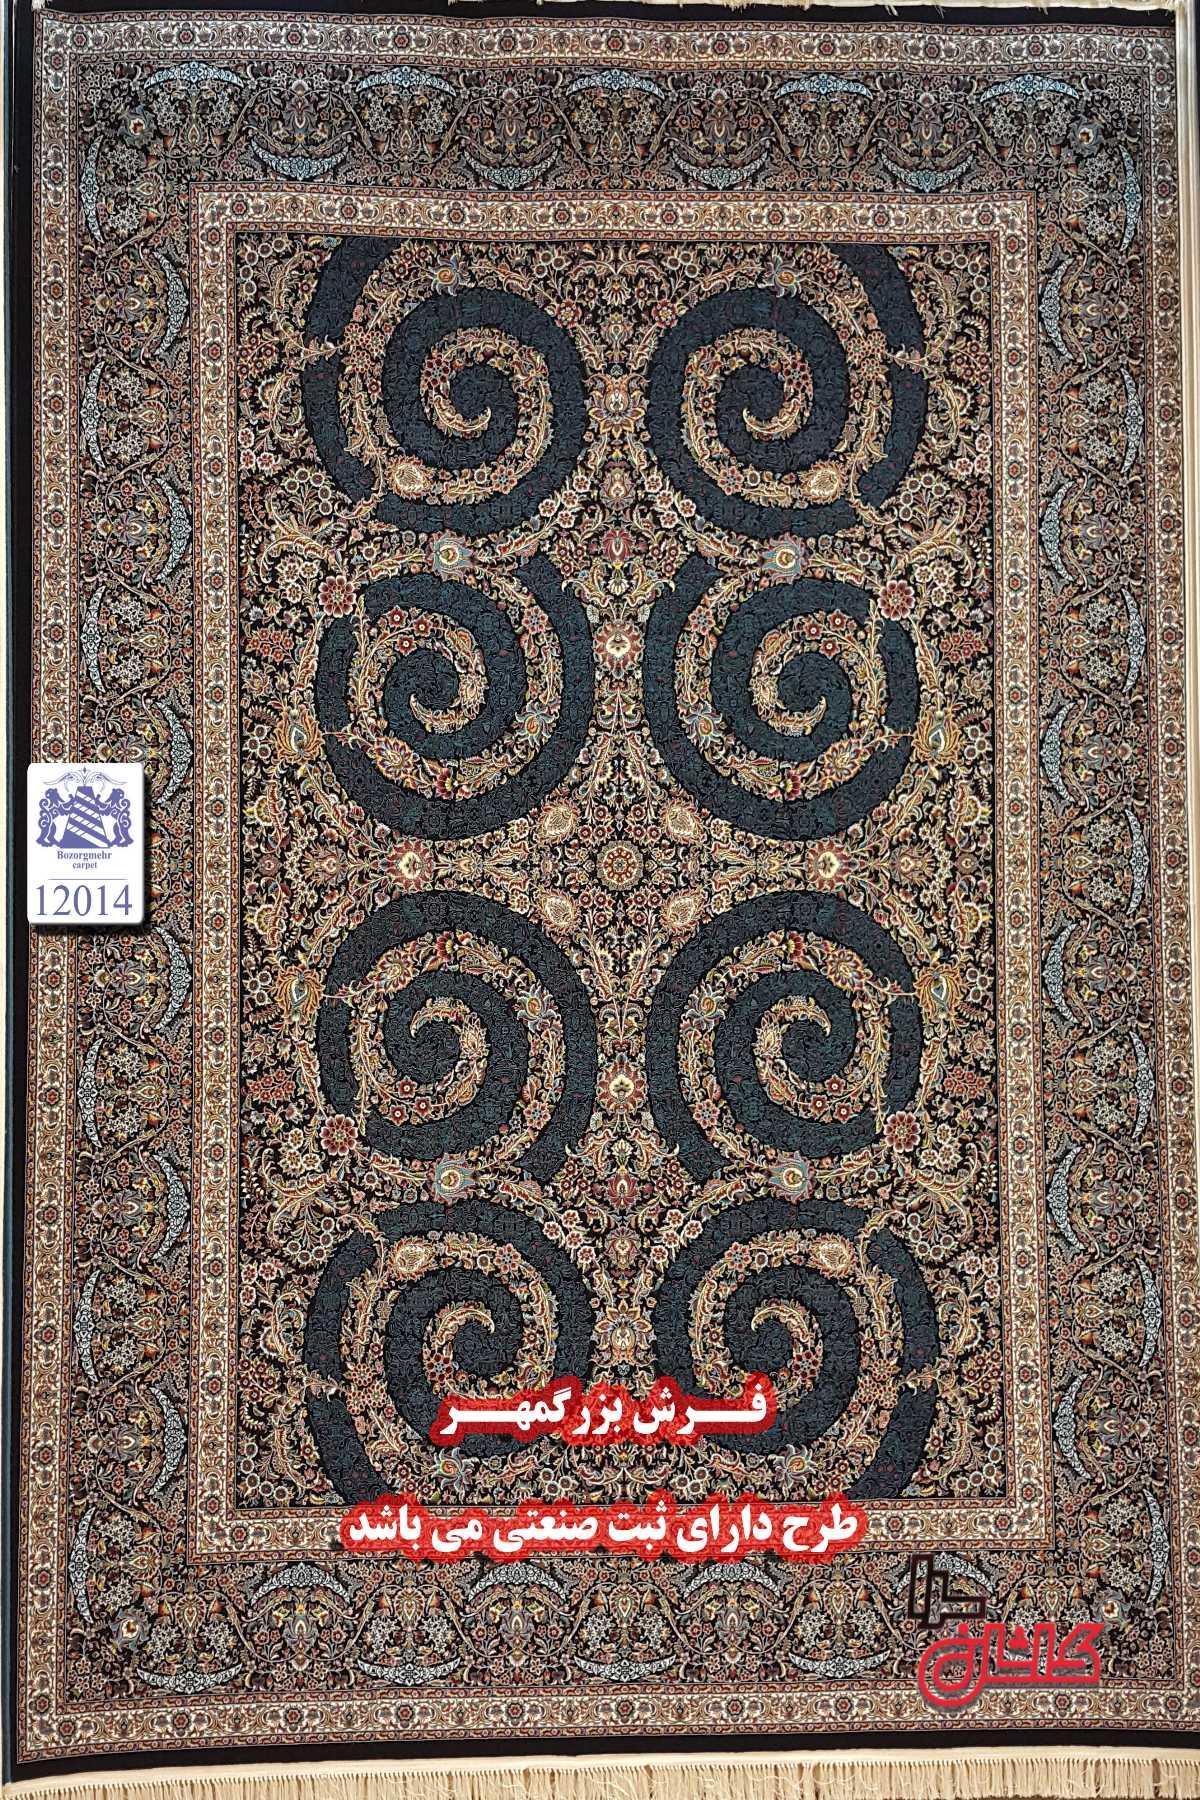 bozorgmehr-1200-reeds-12014-s